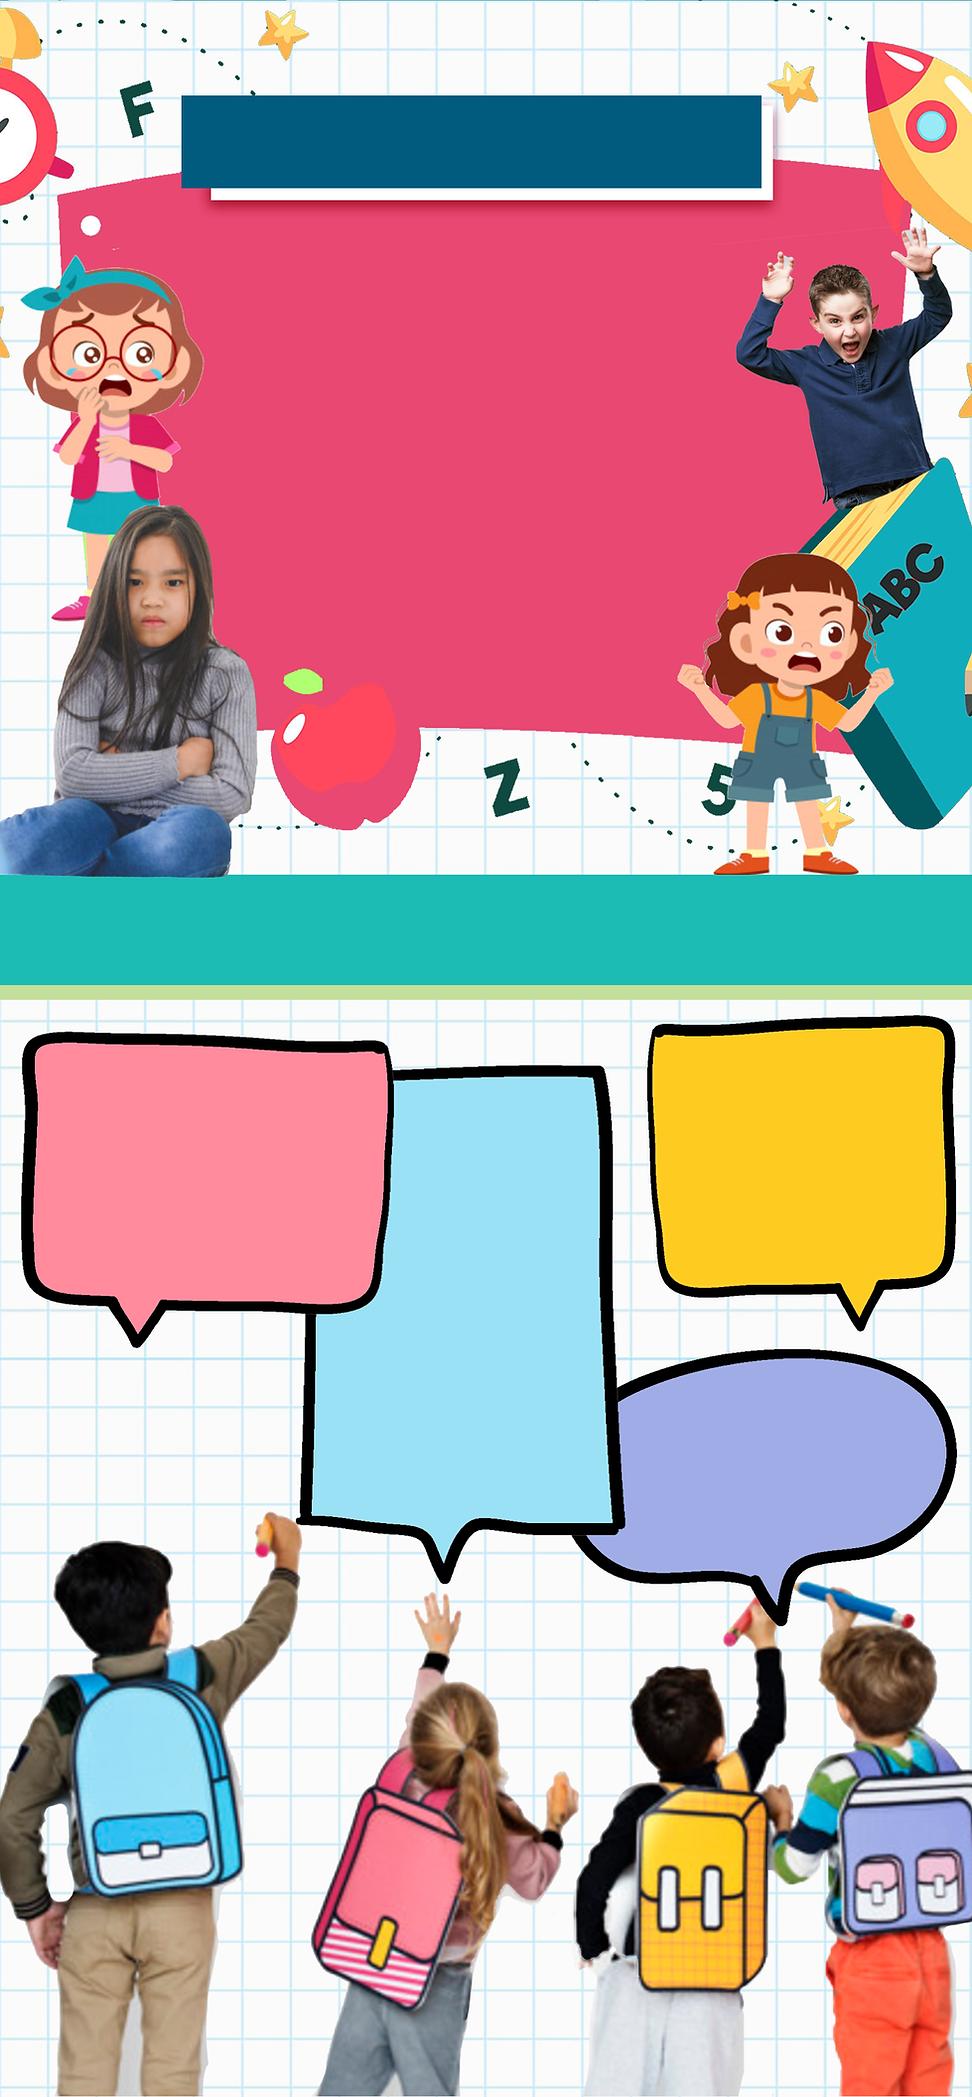 PrimarySchool_SubjectPage_FrustrationsFe